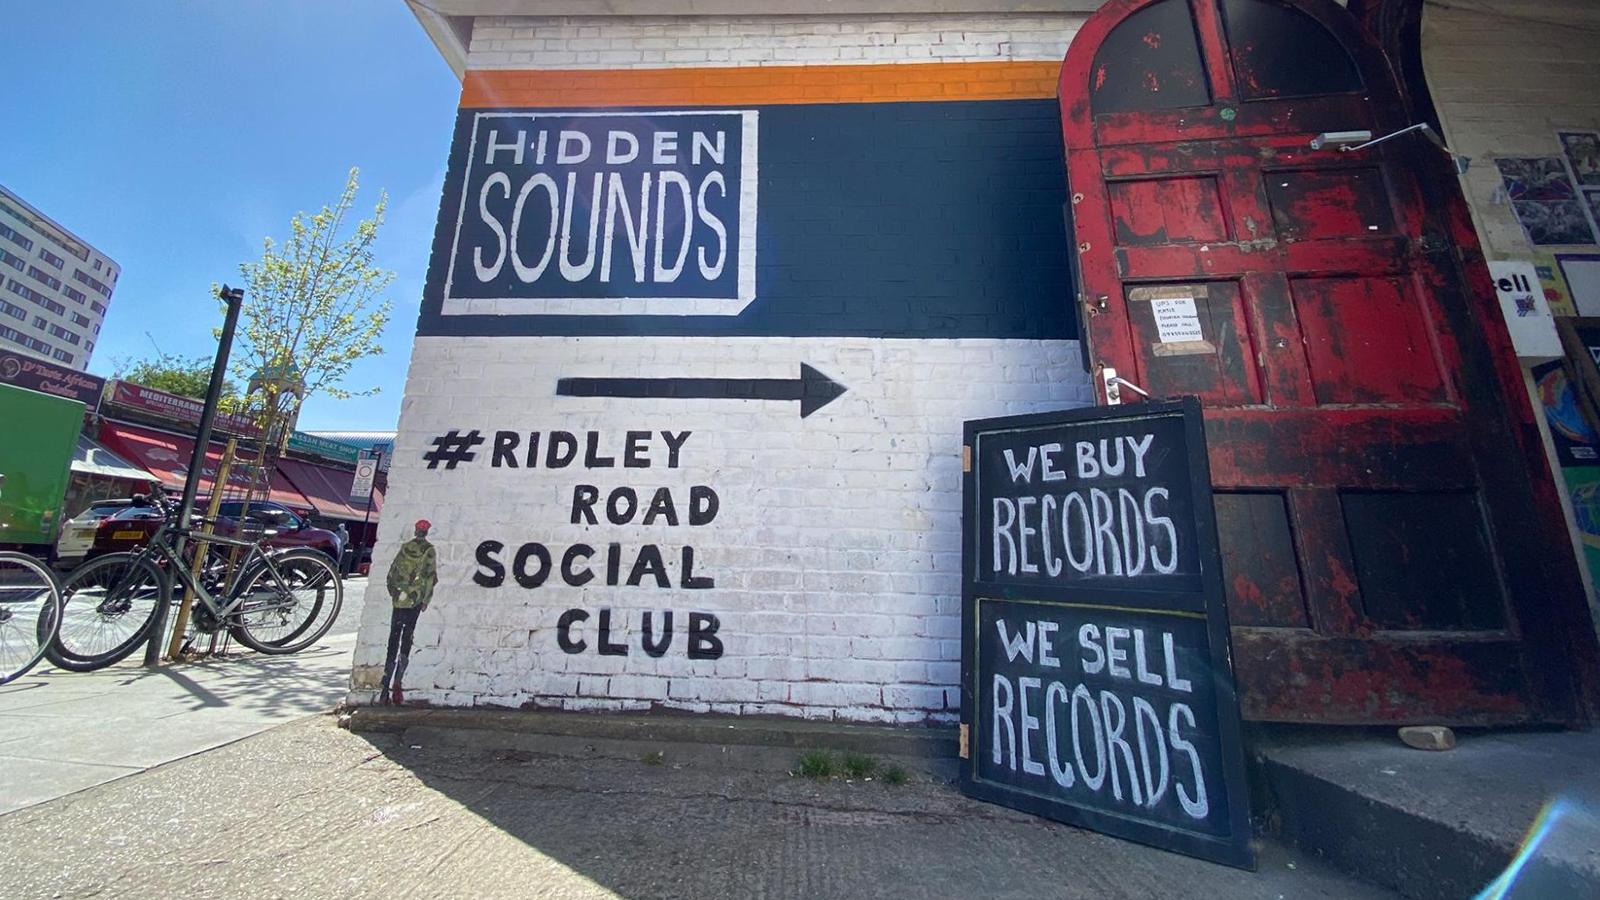 hidden sounds record store london